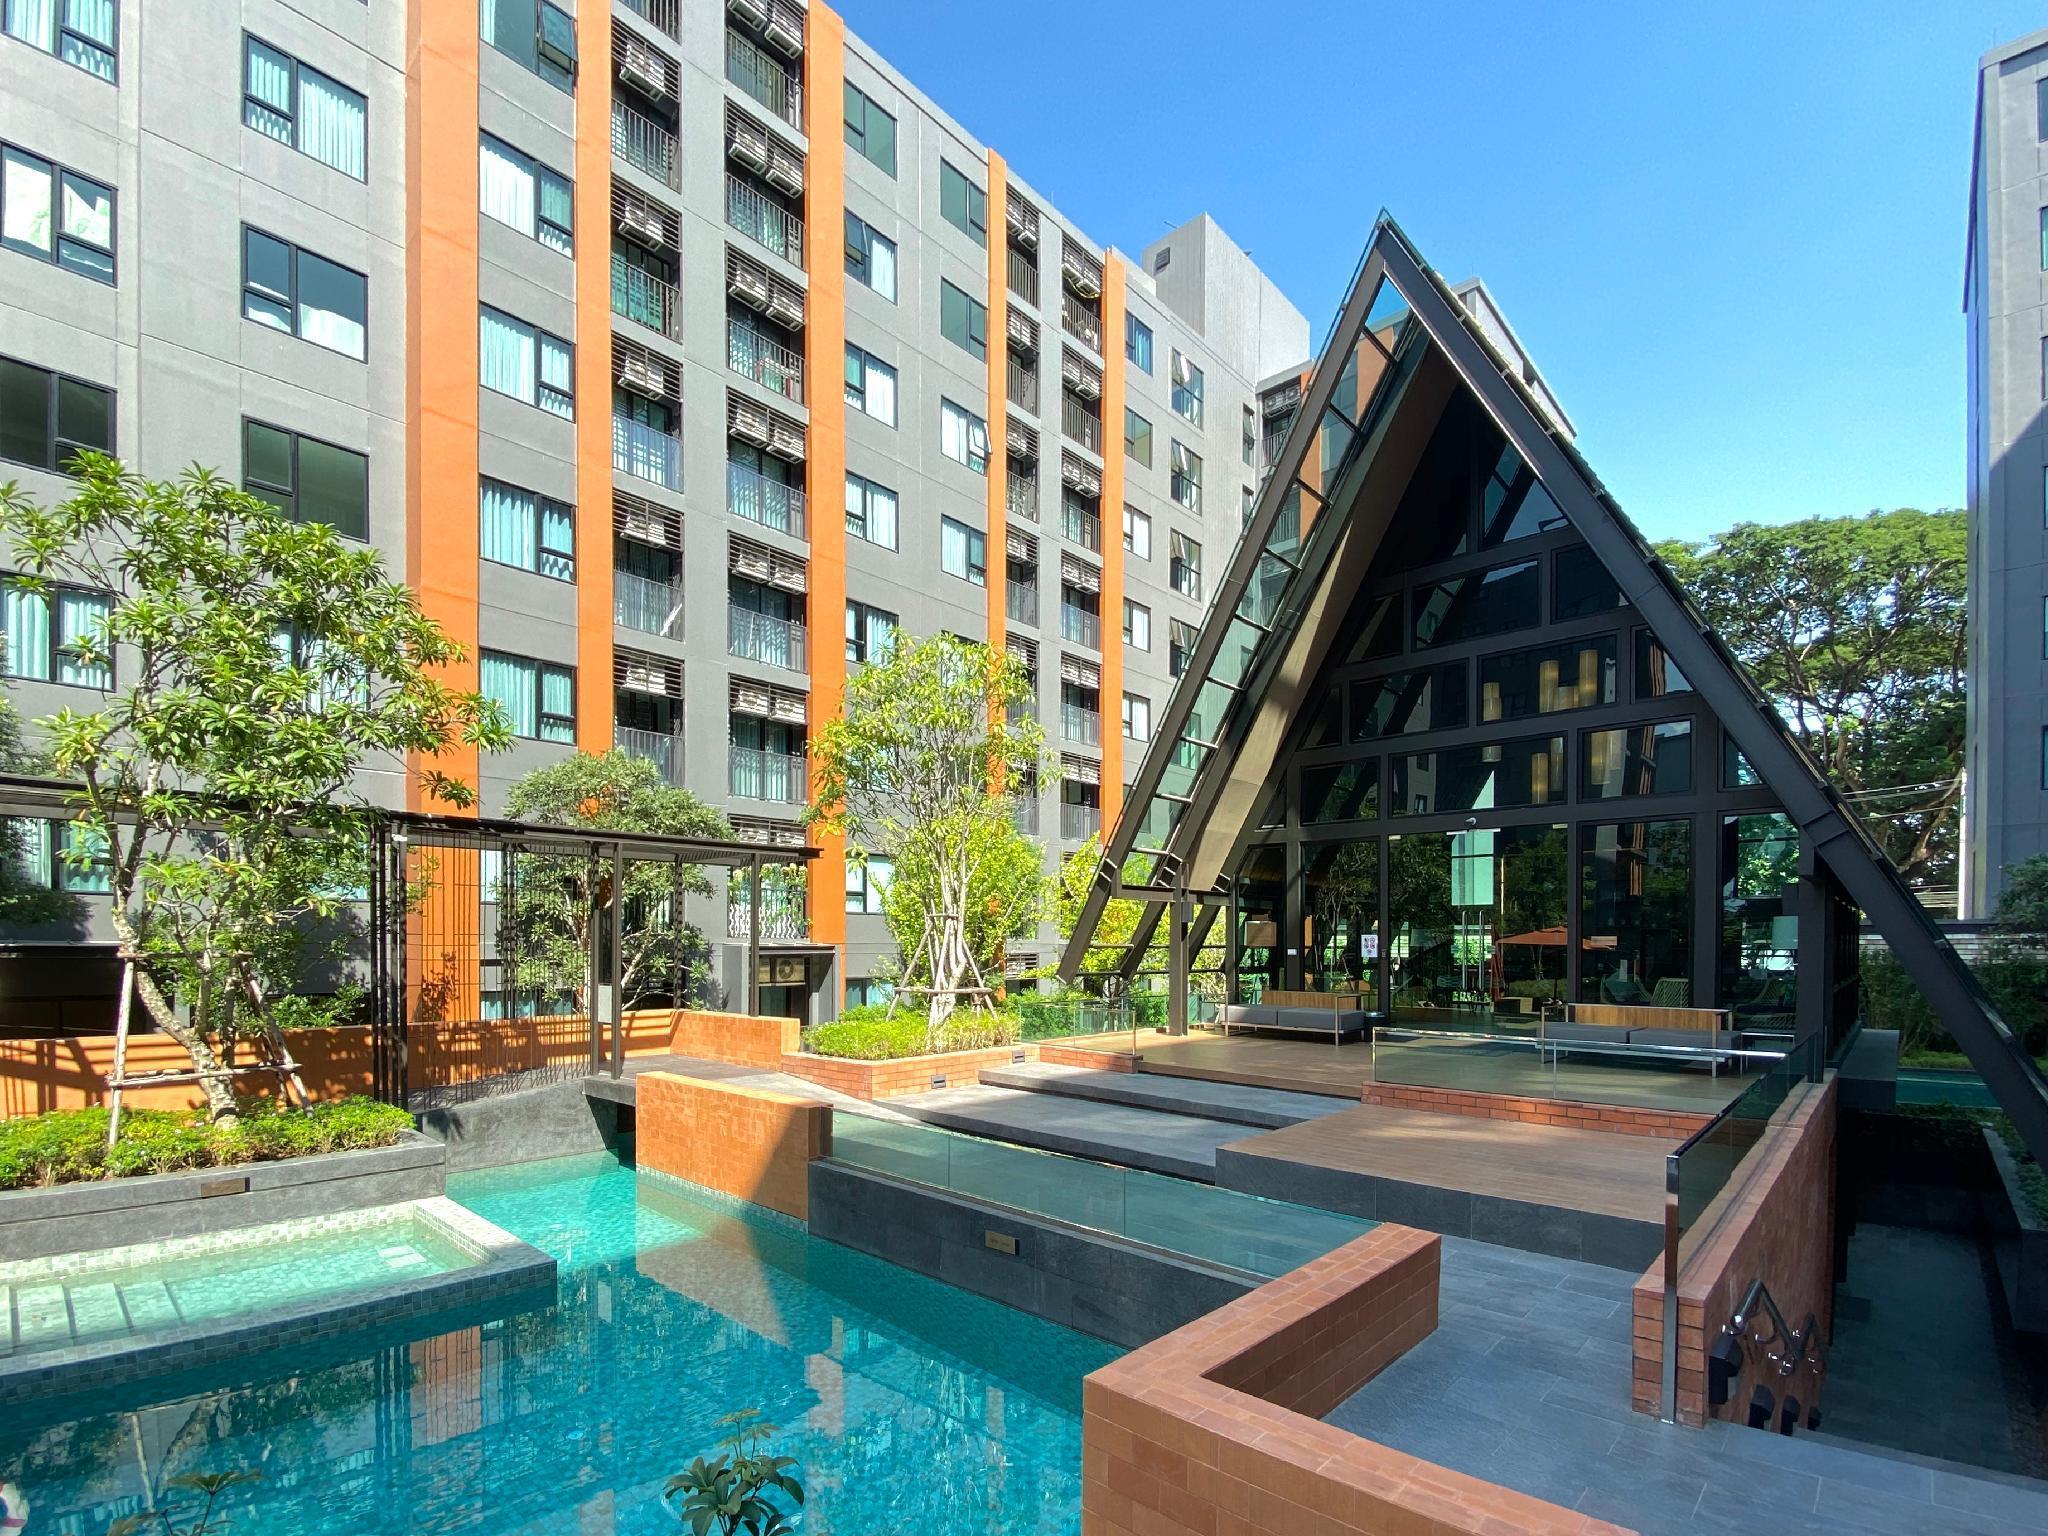 New studio condo for 1-2 guest(s) (Long-term stay) สตูดิโอ อพาร์ตเมนต์ 1 ห้องน้ำส่วนตัว ขนาด 24 ตร.ม. – ฟ้าฮ่าม